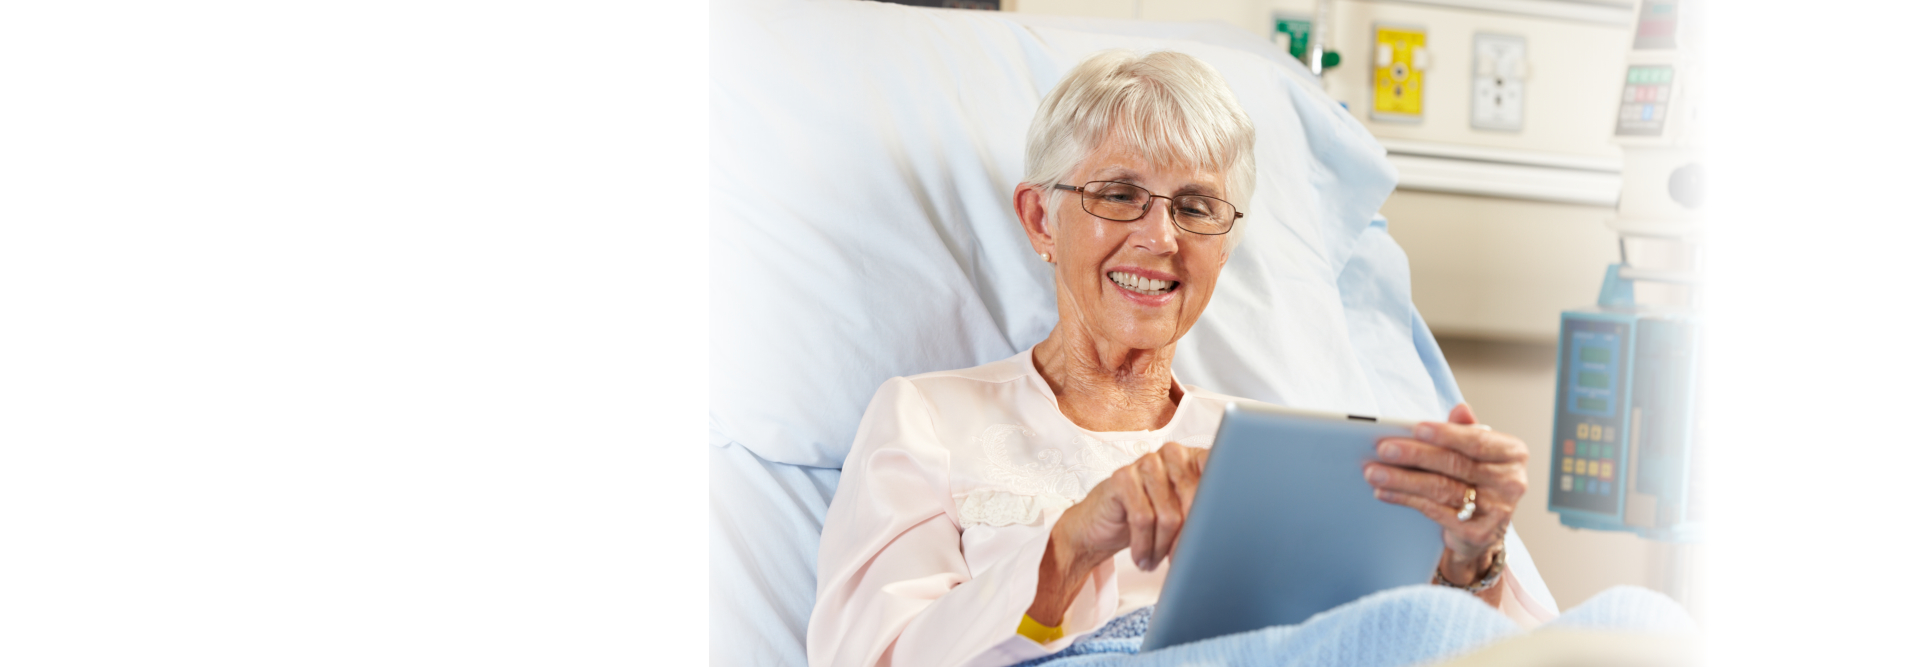 elderly woman using tablet